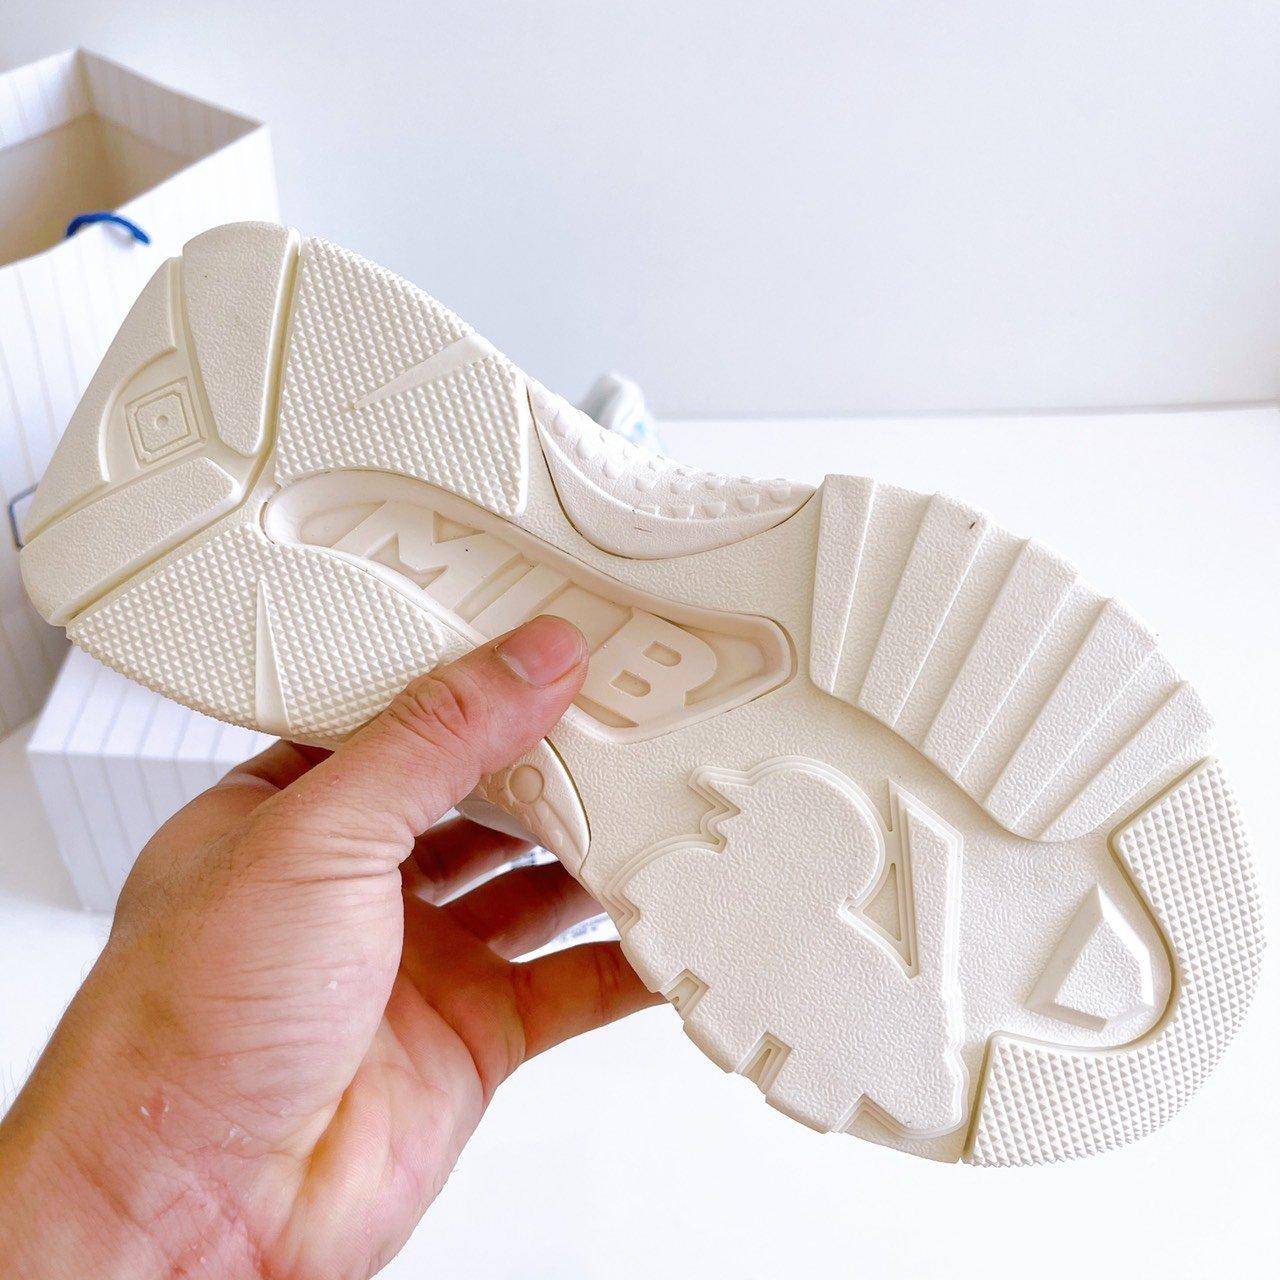 giày mlb shopgiayreplica